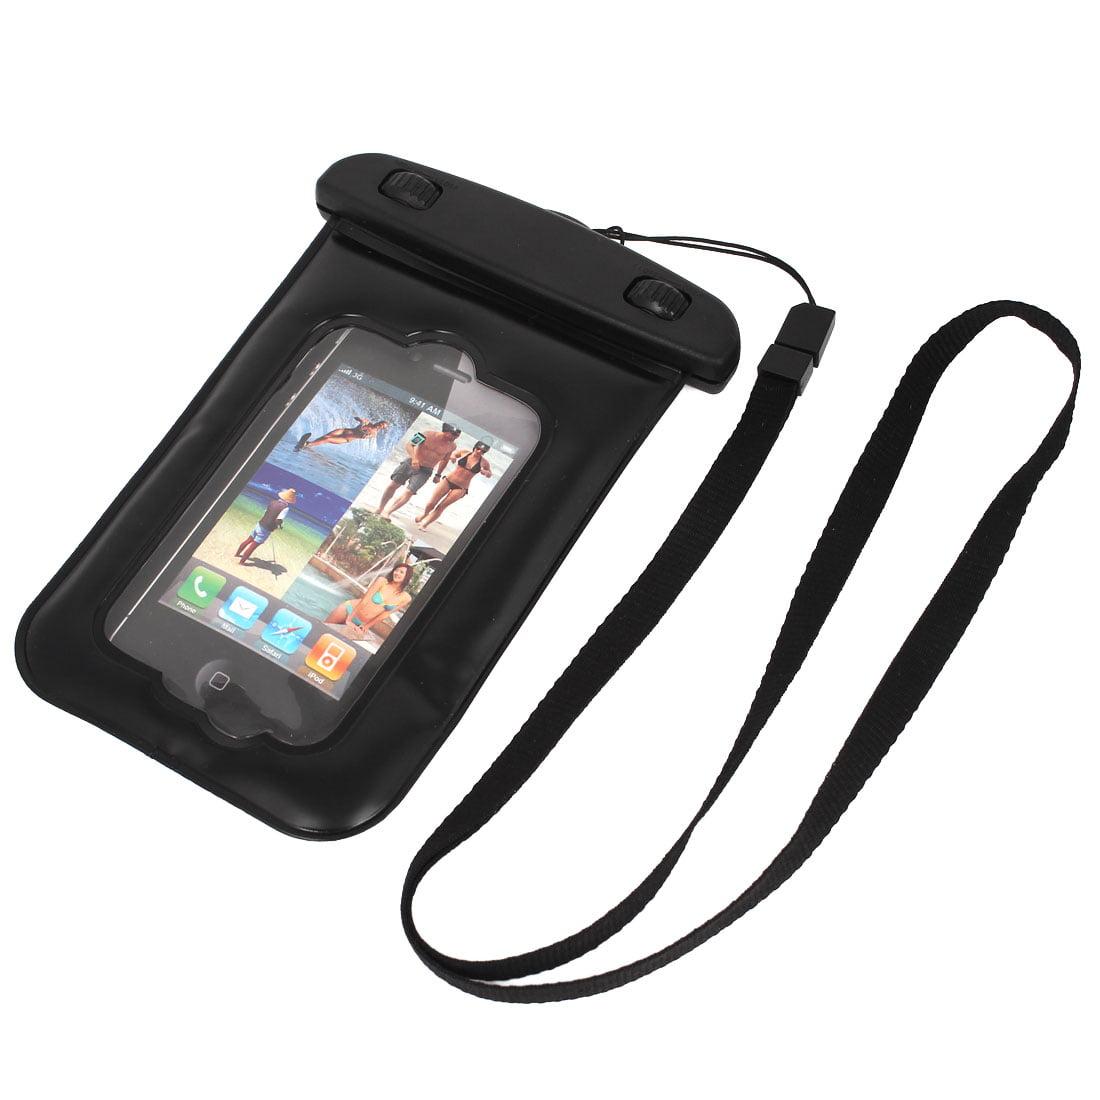 Unique Bargains Waterproof Bag Holder Pouch Case Black for iPhone 4/4S w Neck Strap